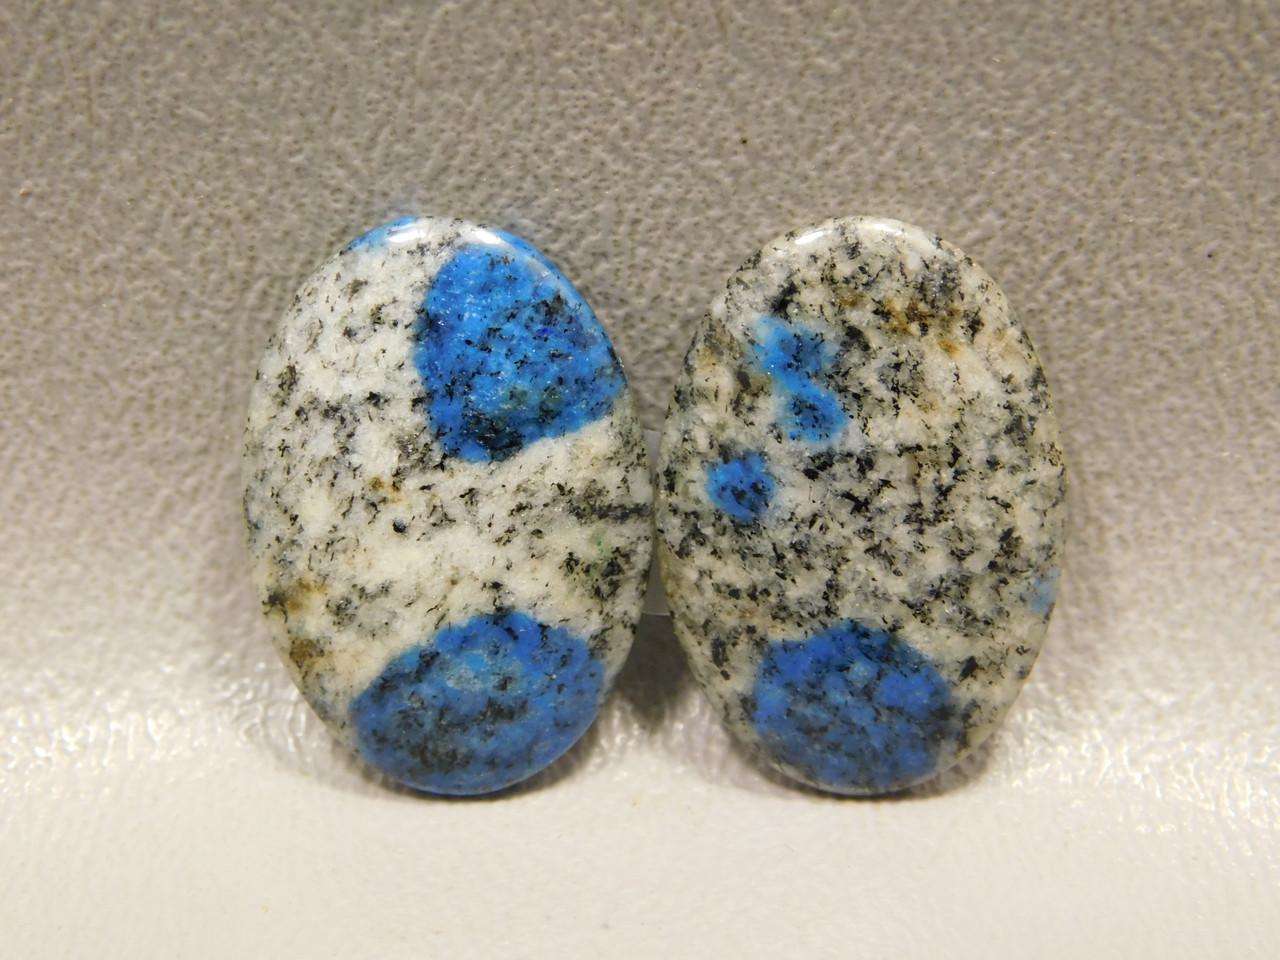 Cabochons Azurite Jasper Stone Semiprecious Matched Pairs #4